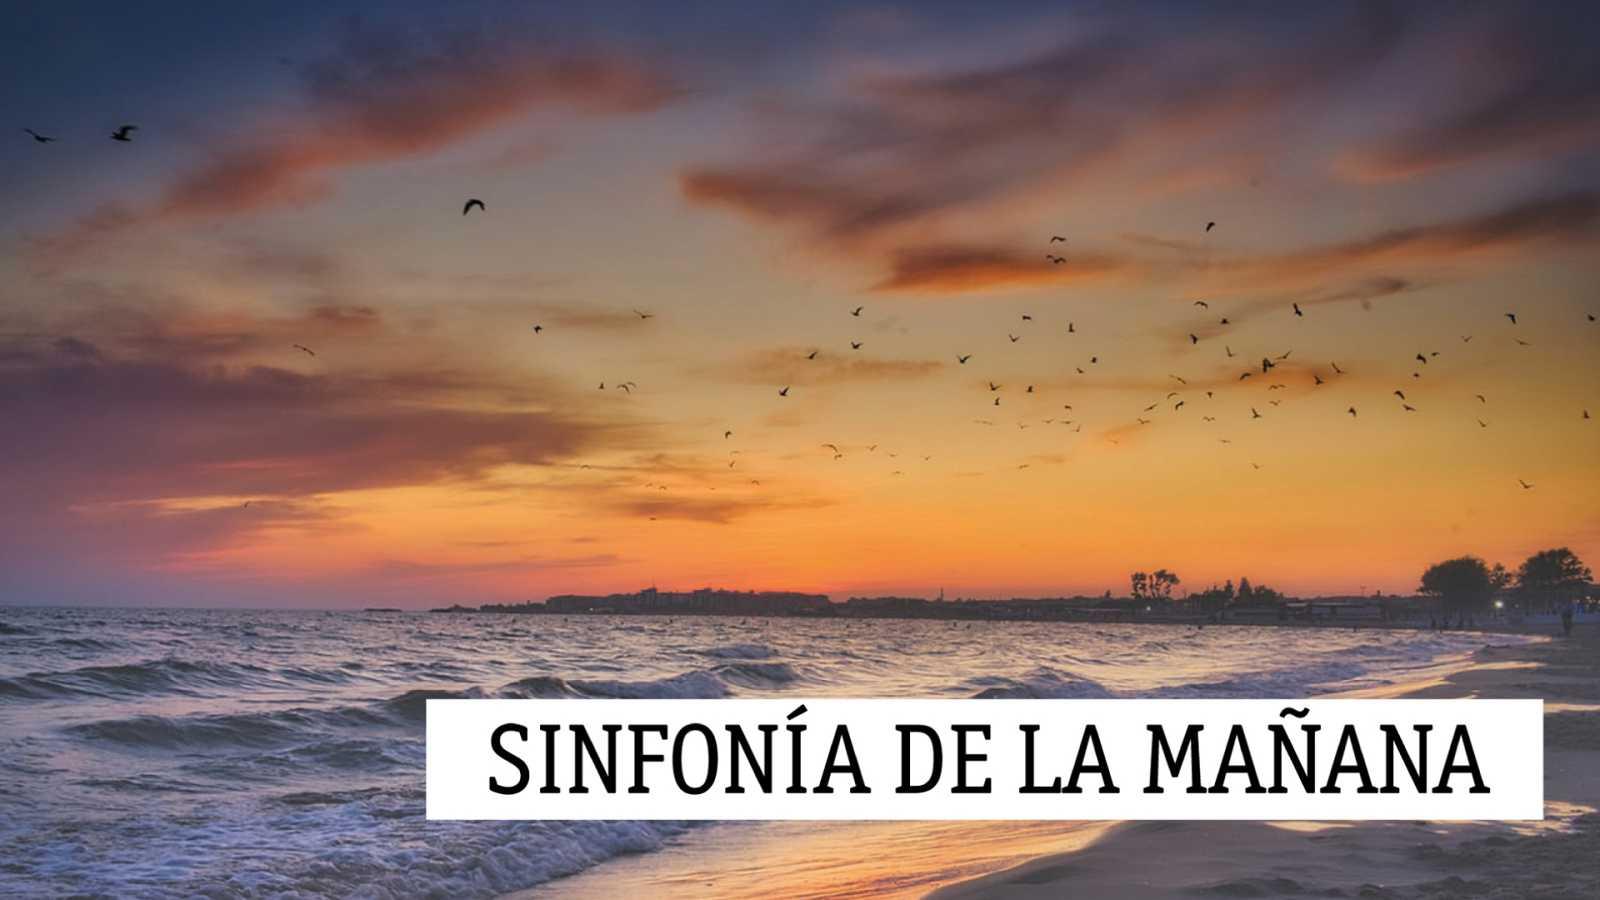 Sinfonía de la mañana - Homenaje a Joan Margarit - 19/02/21 - escuchar ahora